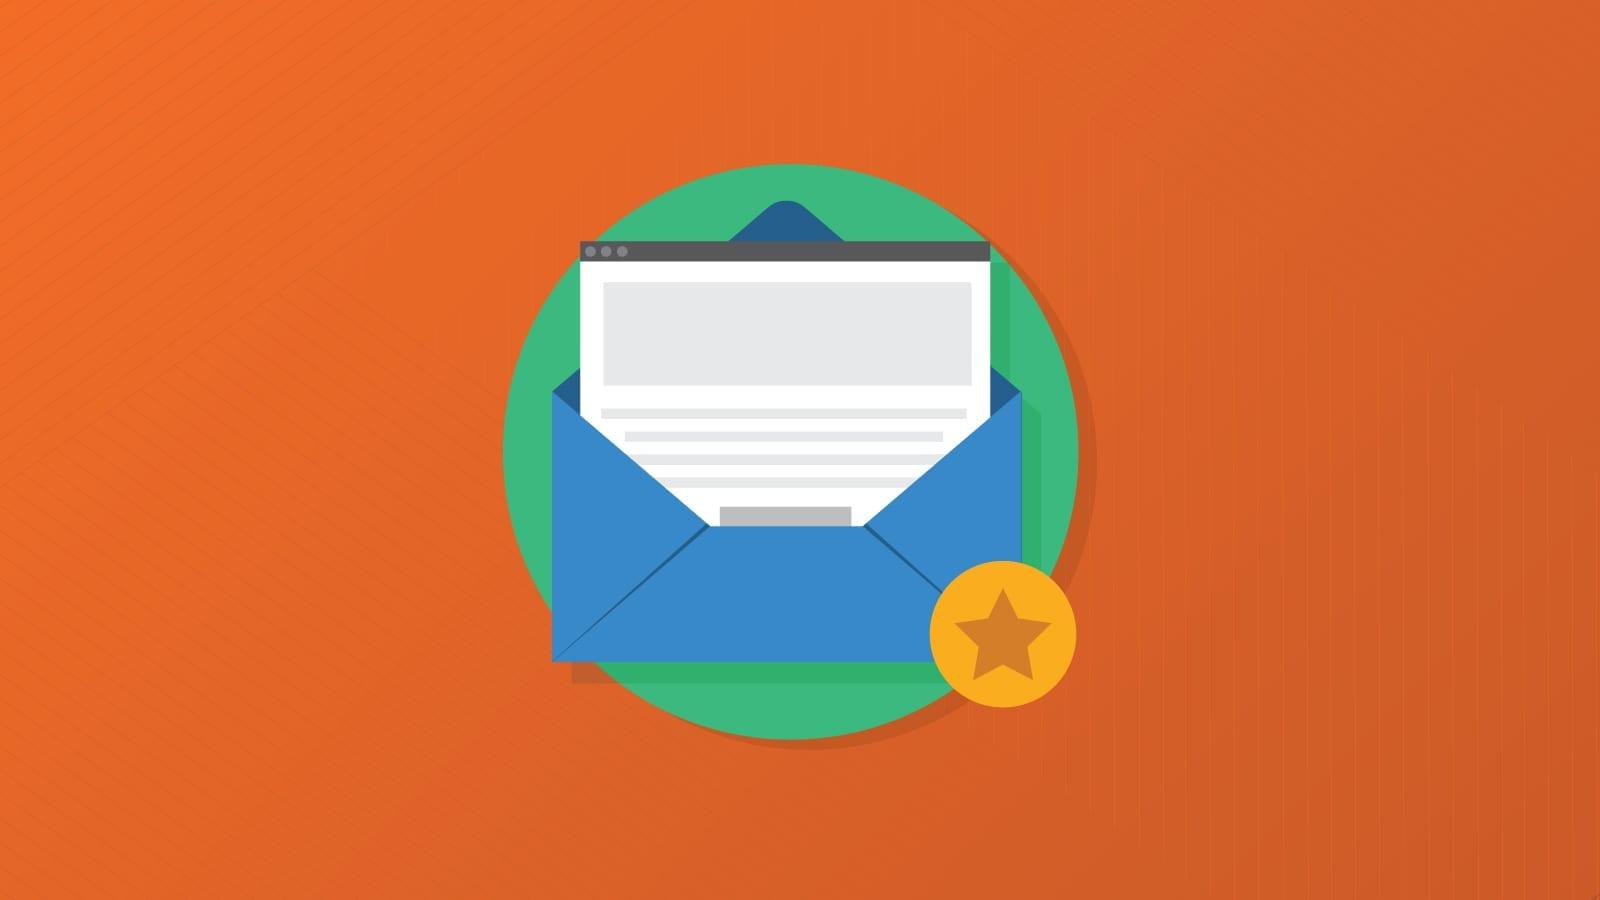 Email design inspiration